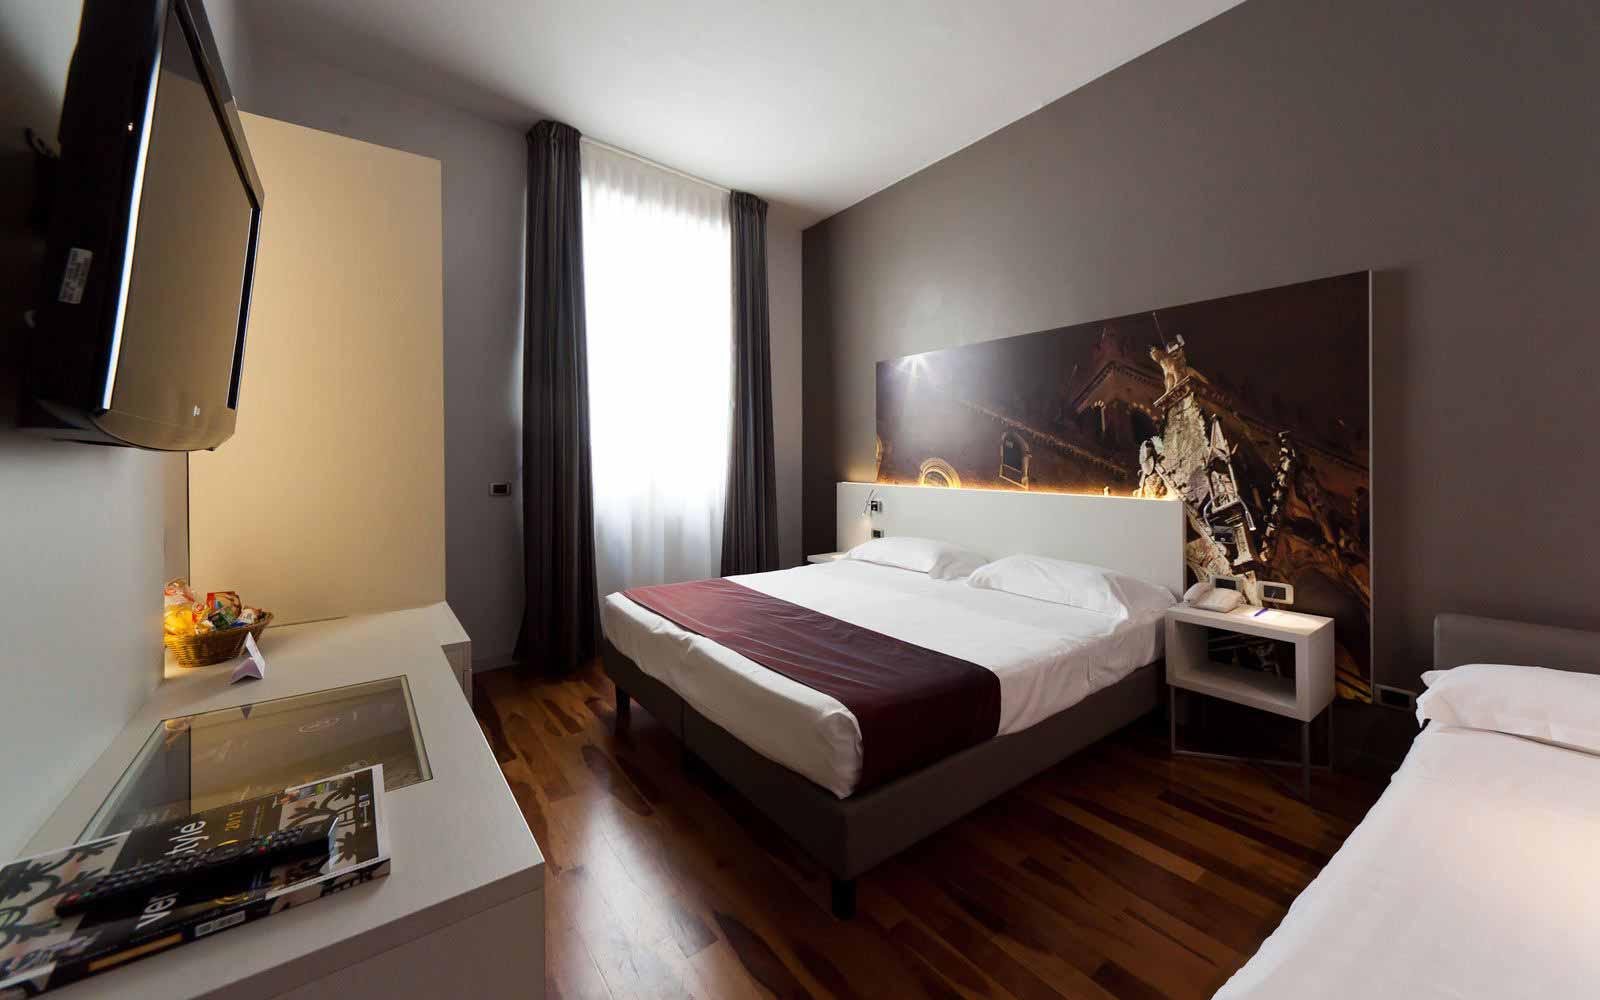 Triple room at Hotel Giulietta & Romeo